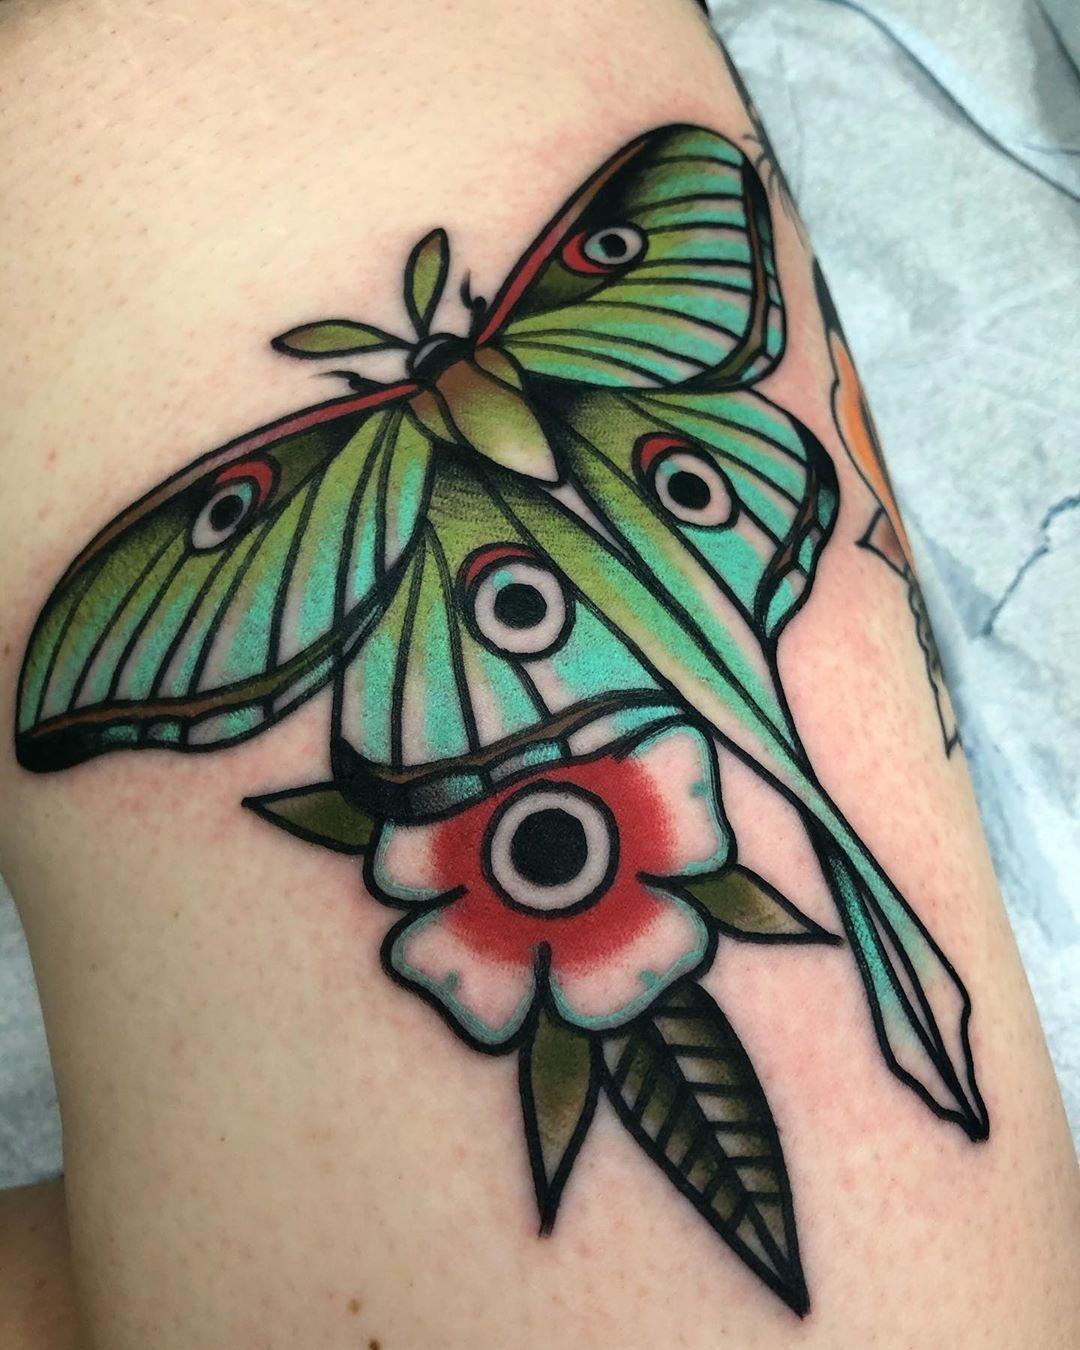 1 Vibrant Luna Moth Tattoo With Flower Designs